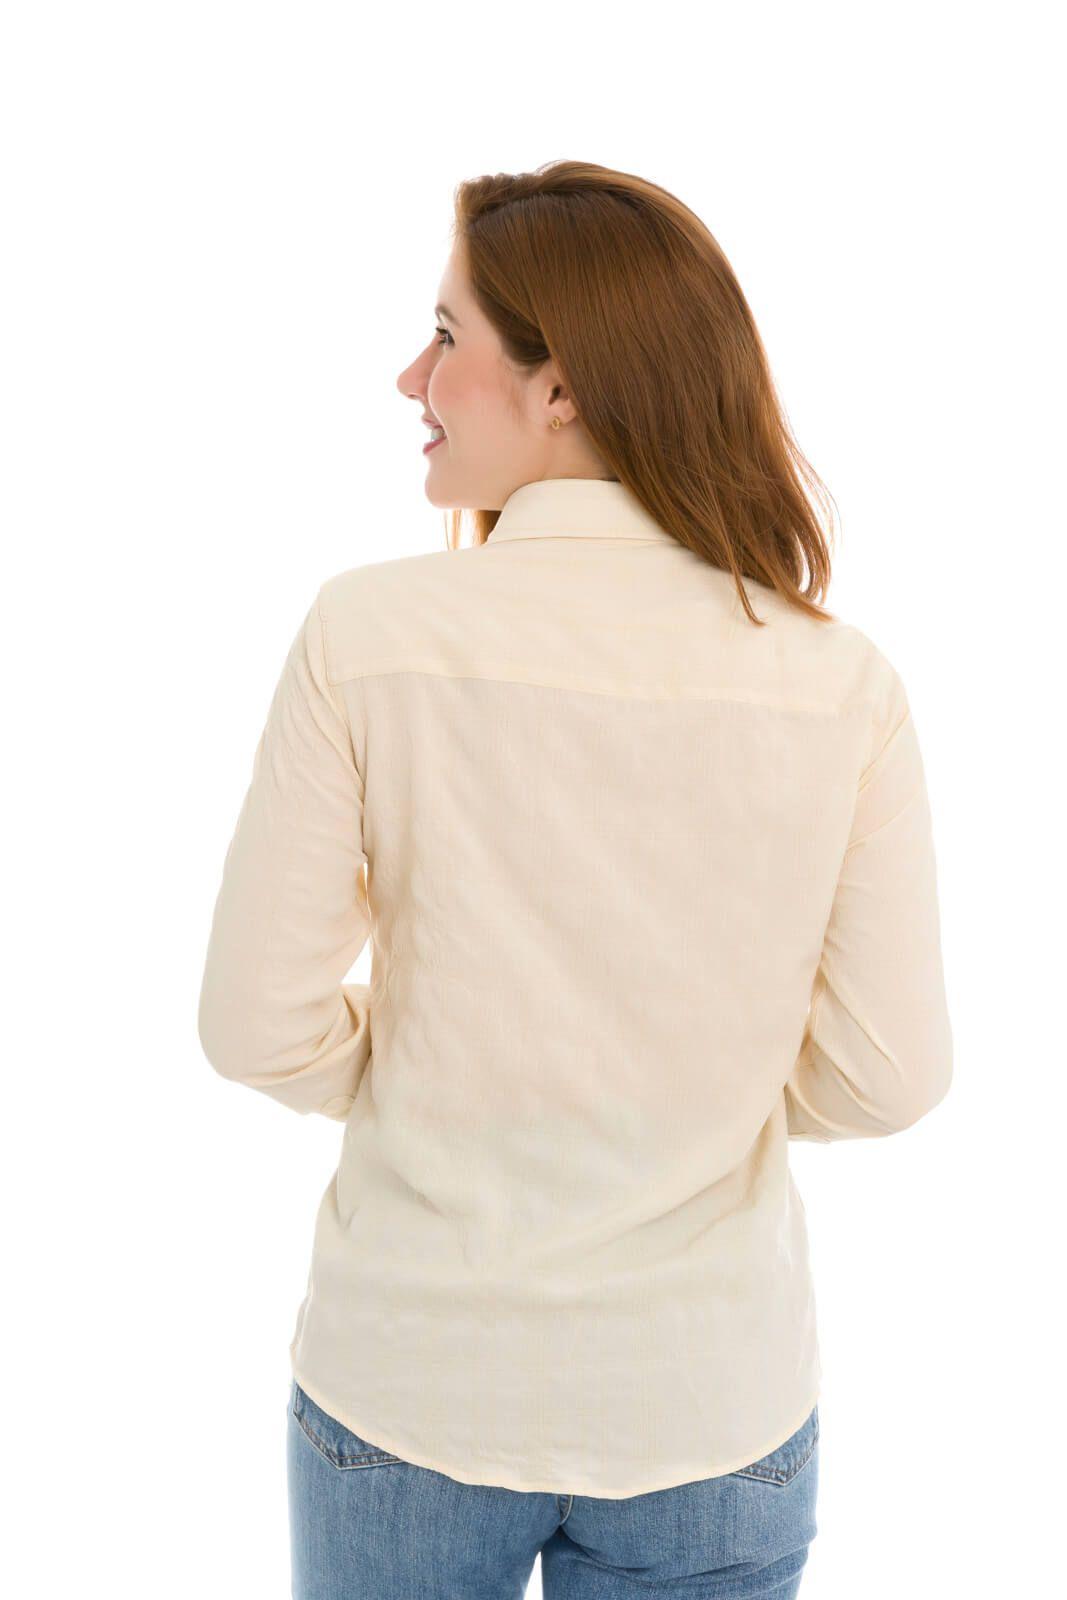 Camisa Camisete Feminino Olimpo Estampada Manga Longa Bege